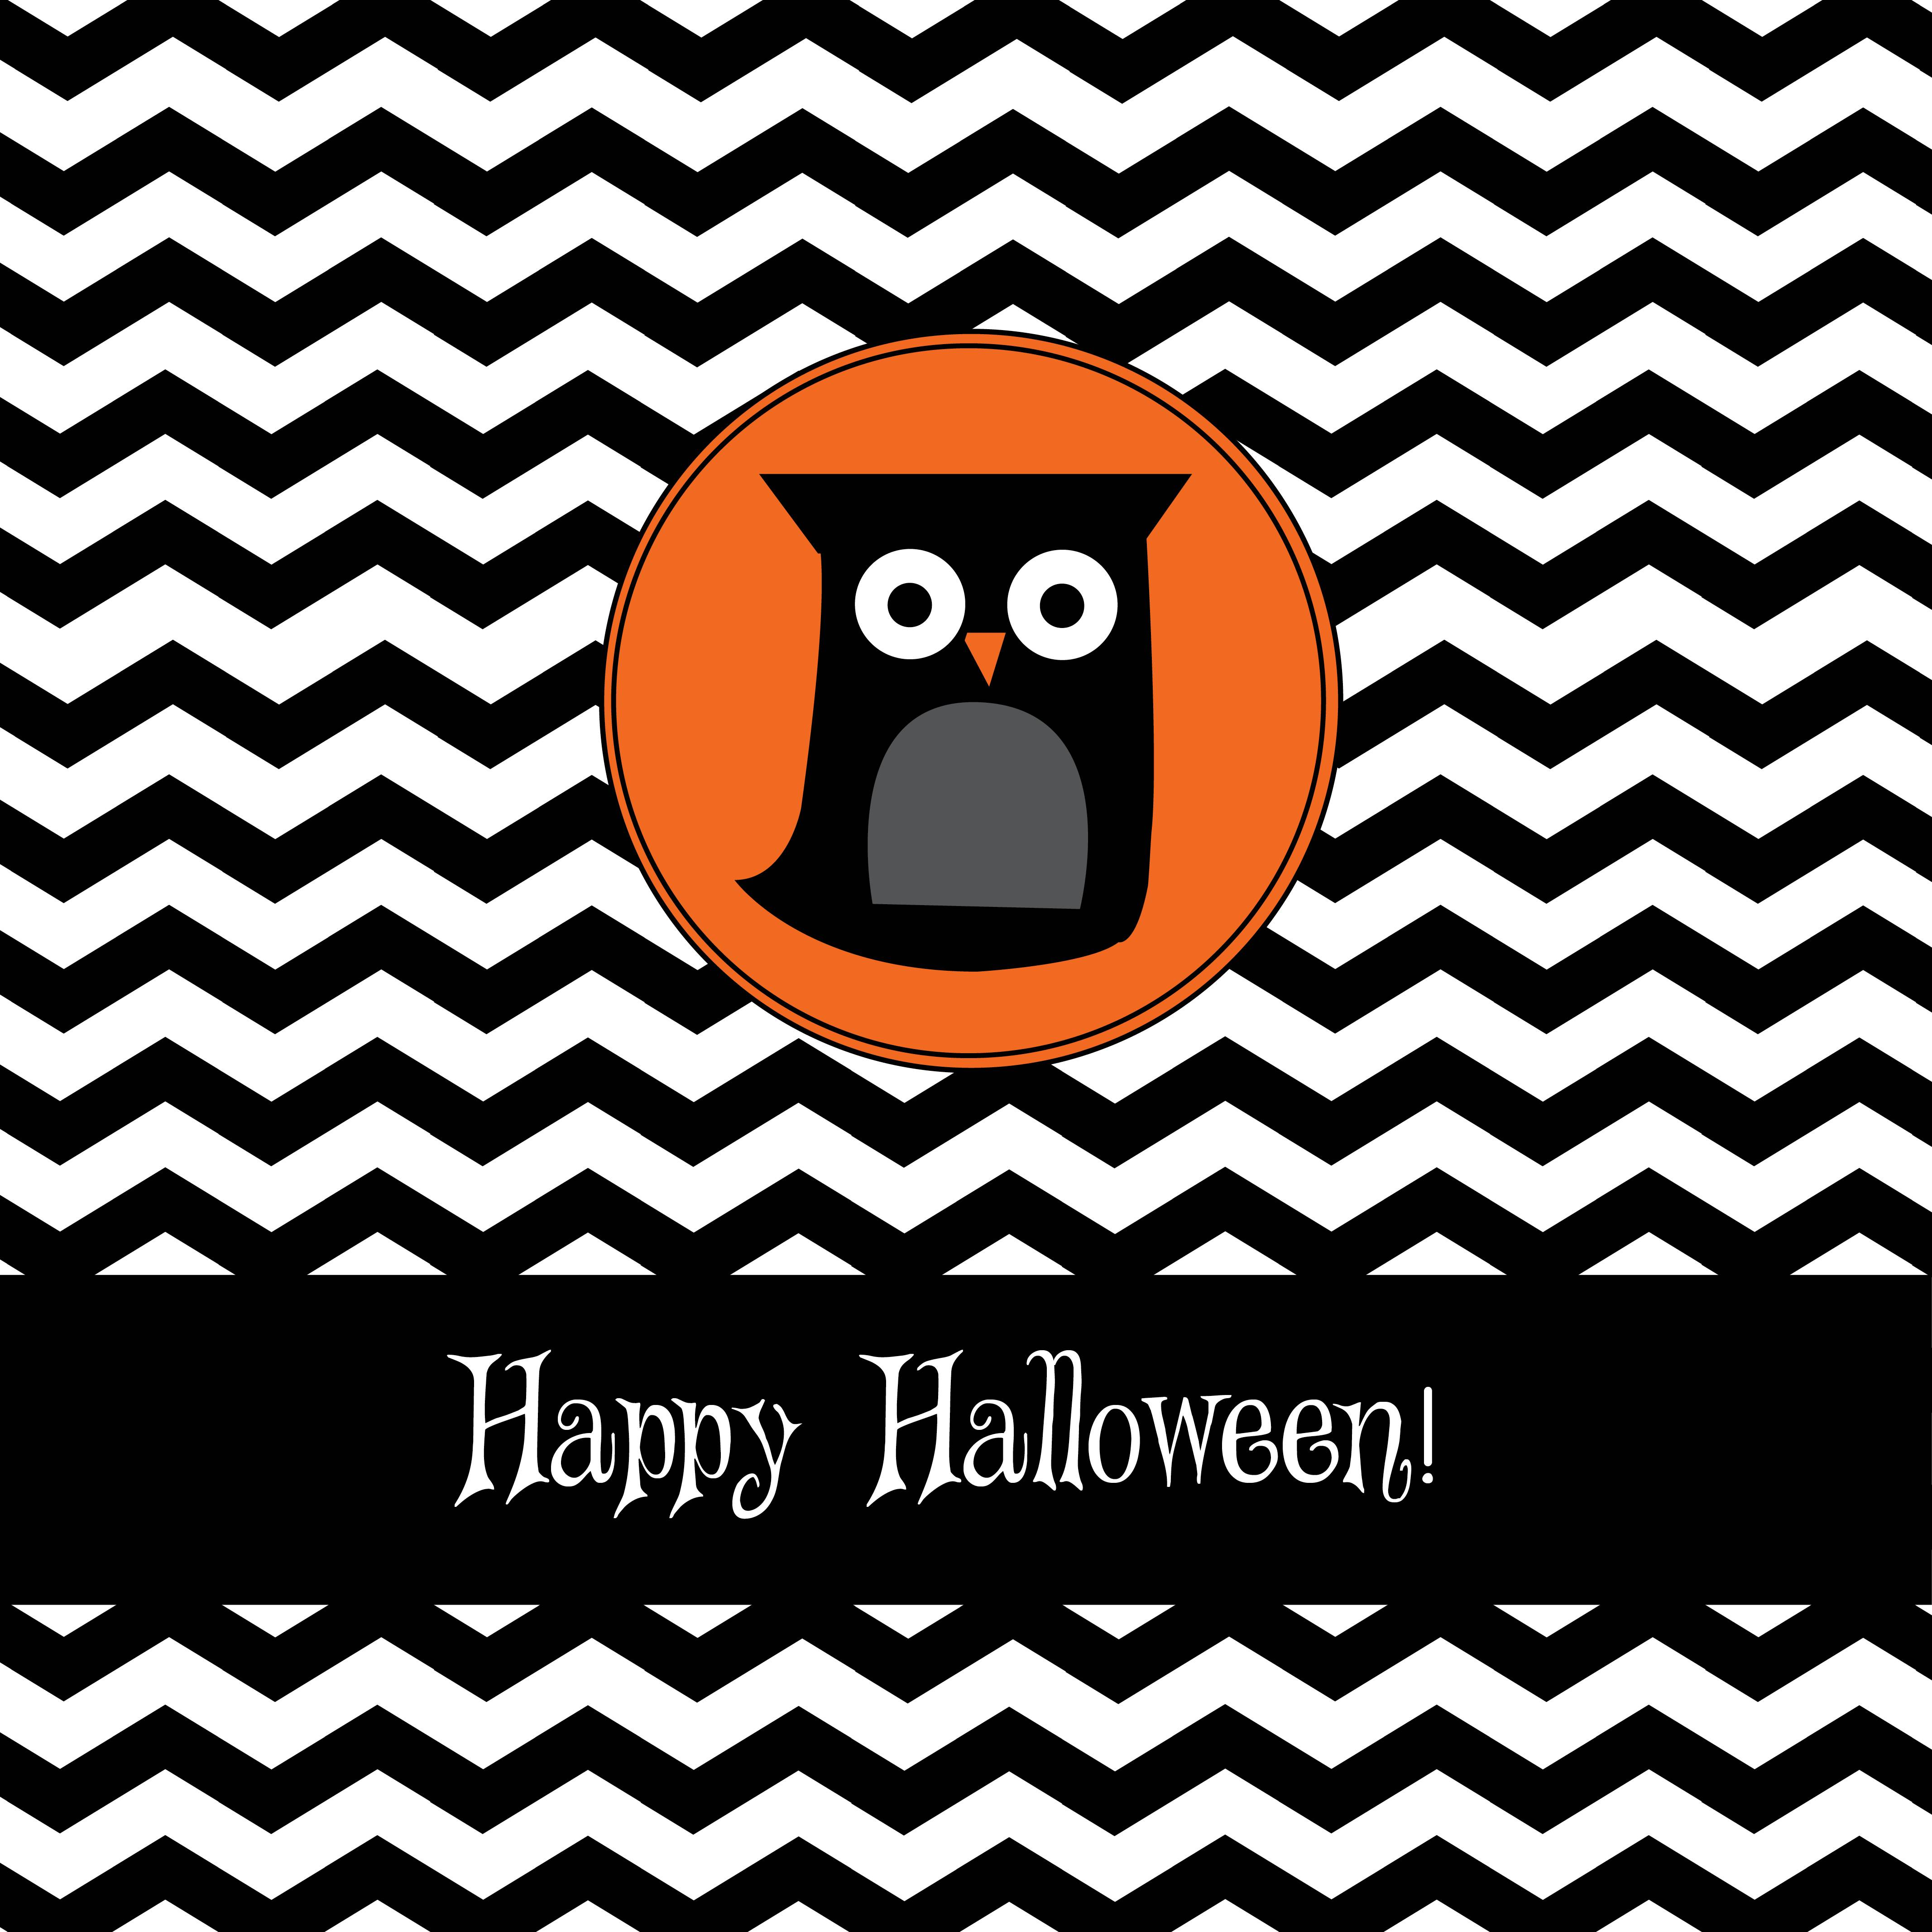 Cute Girly Halloween Wallpapers   Top Cute Girly Halloween 4267x4267